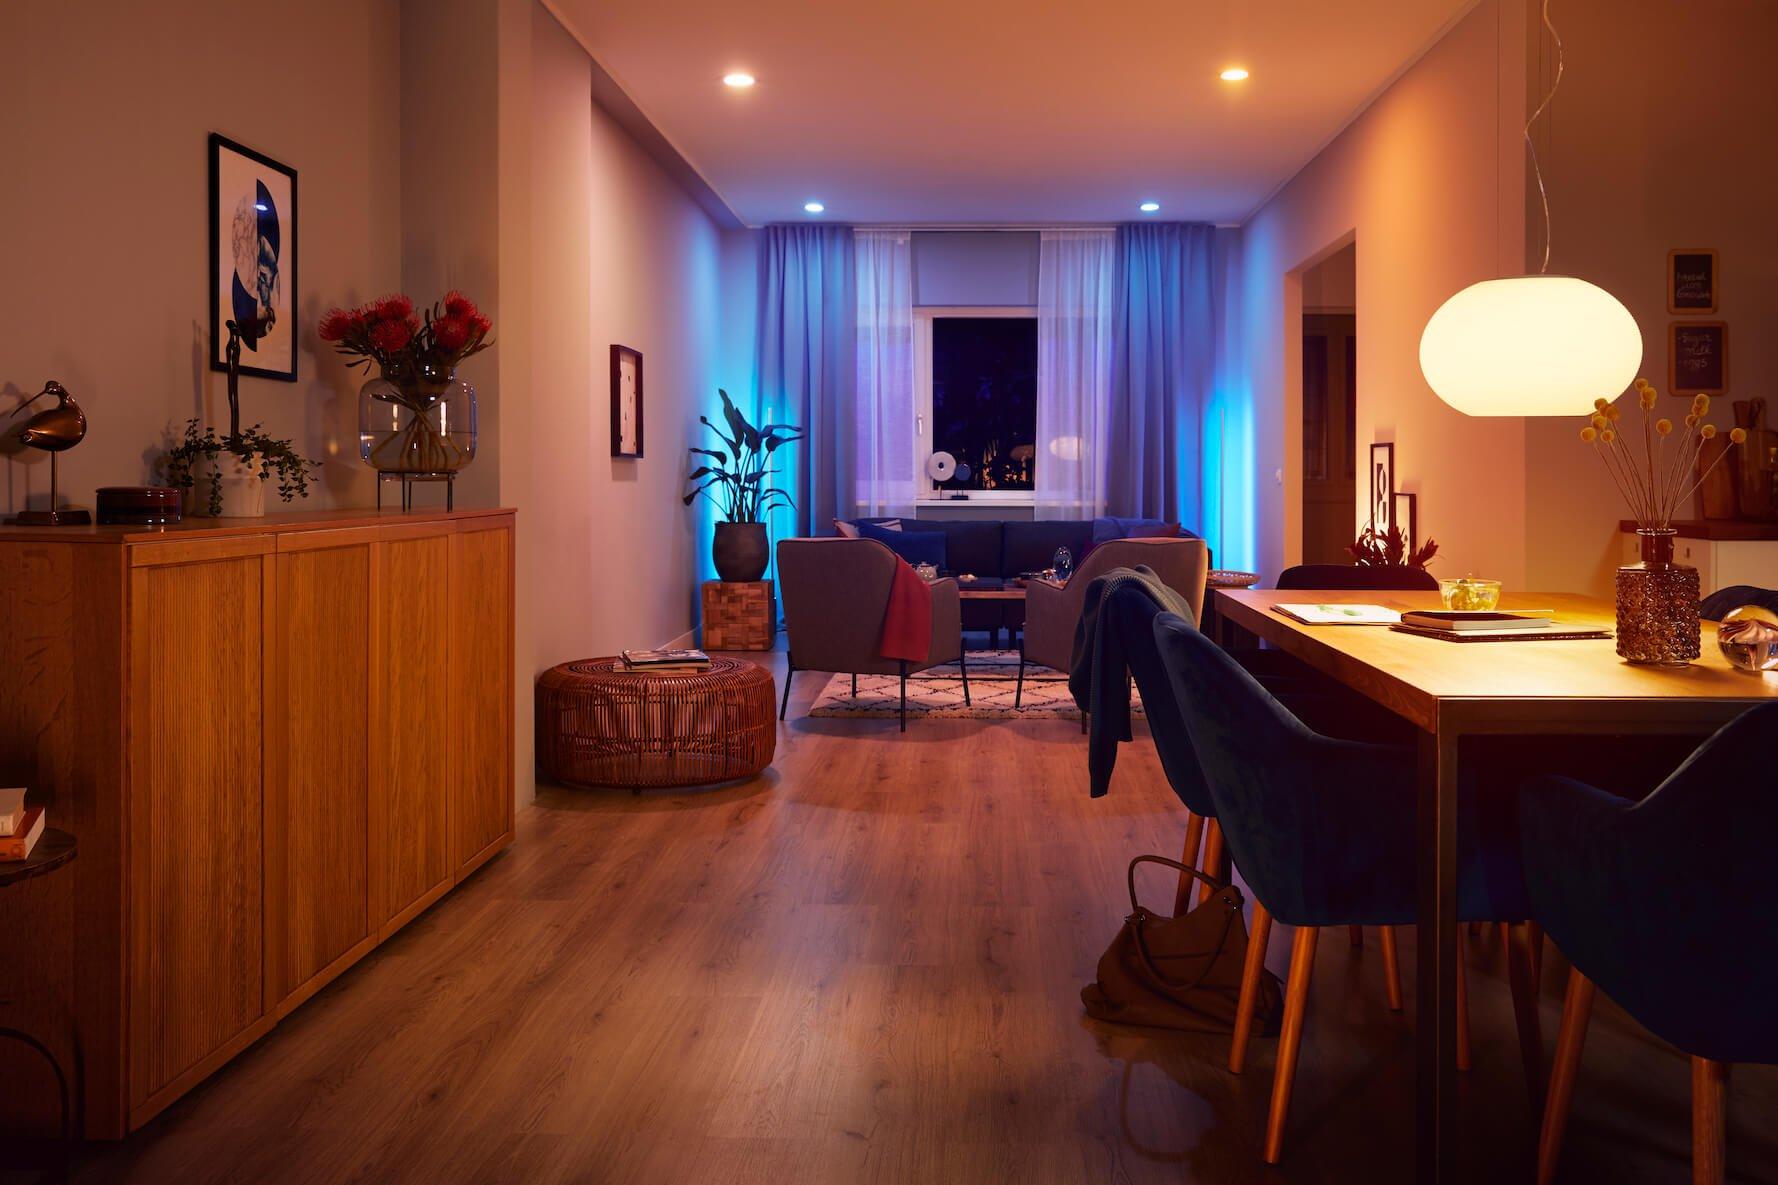 Energy efficient Smart LED lighting in your living room